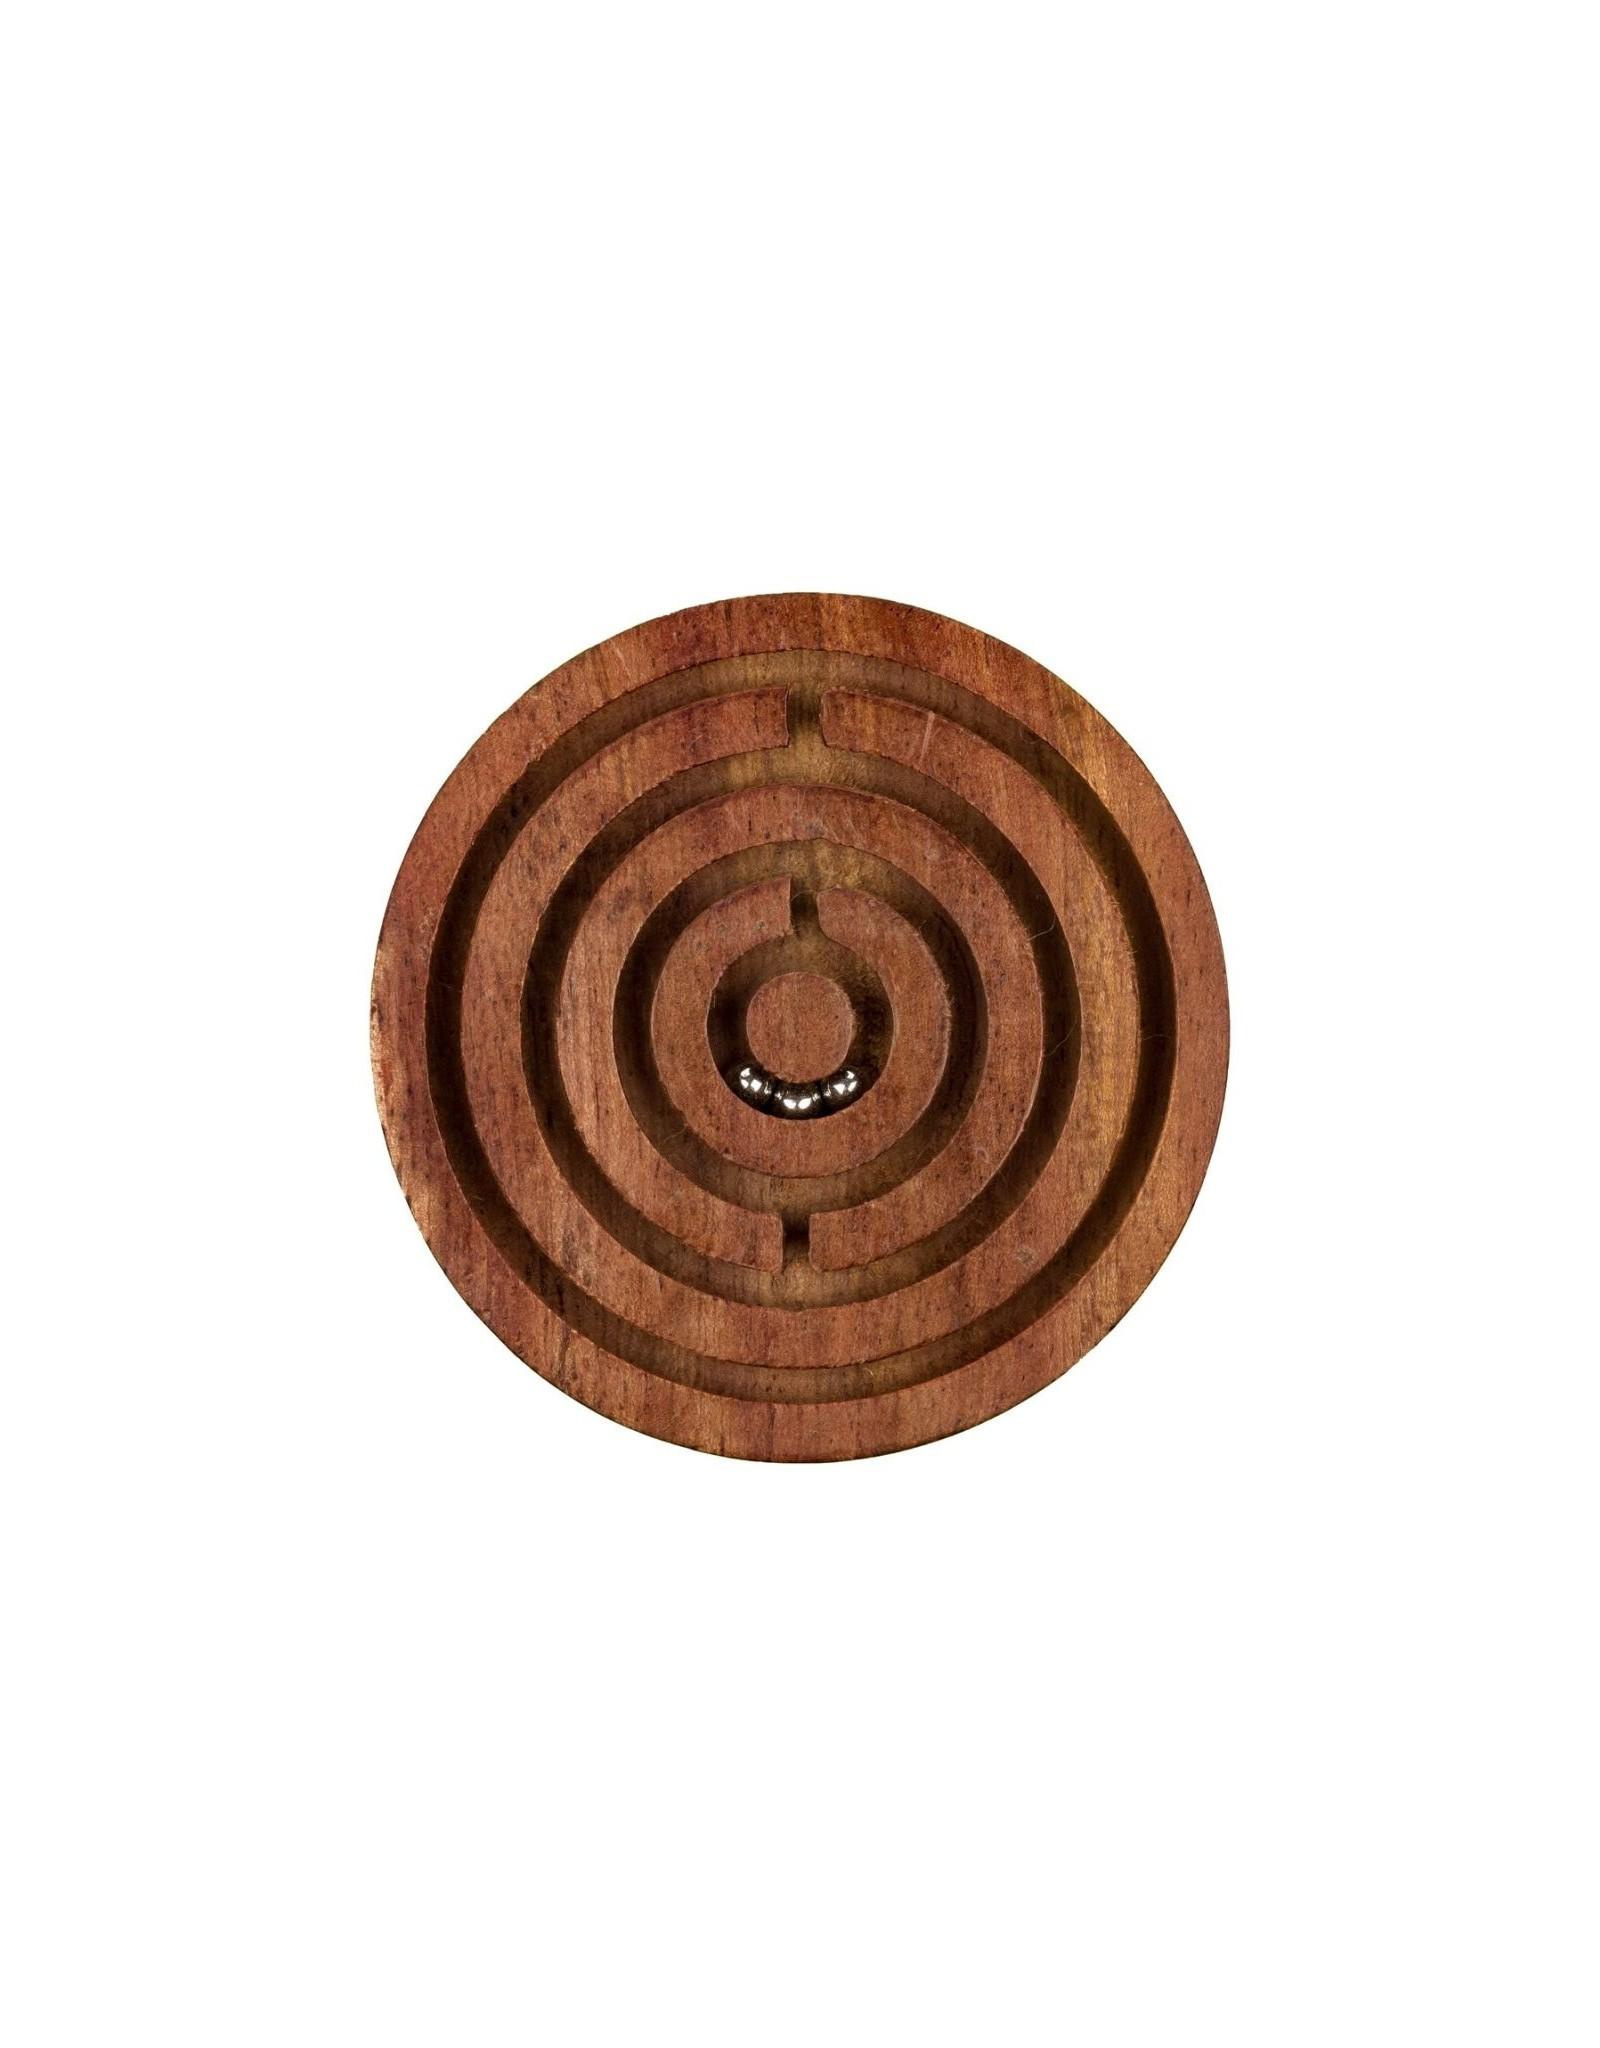 Matr Boomie Mini Labyrinth Game